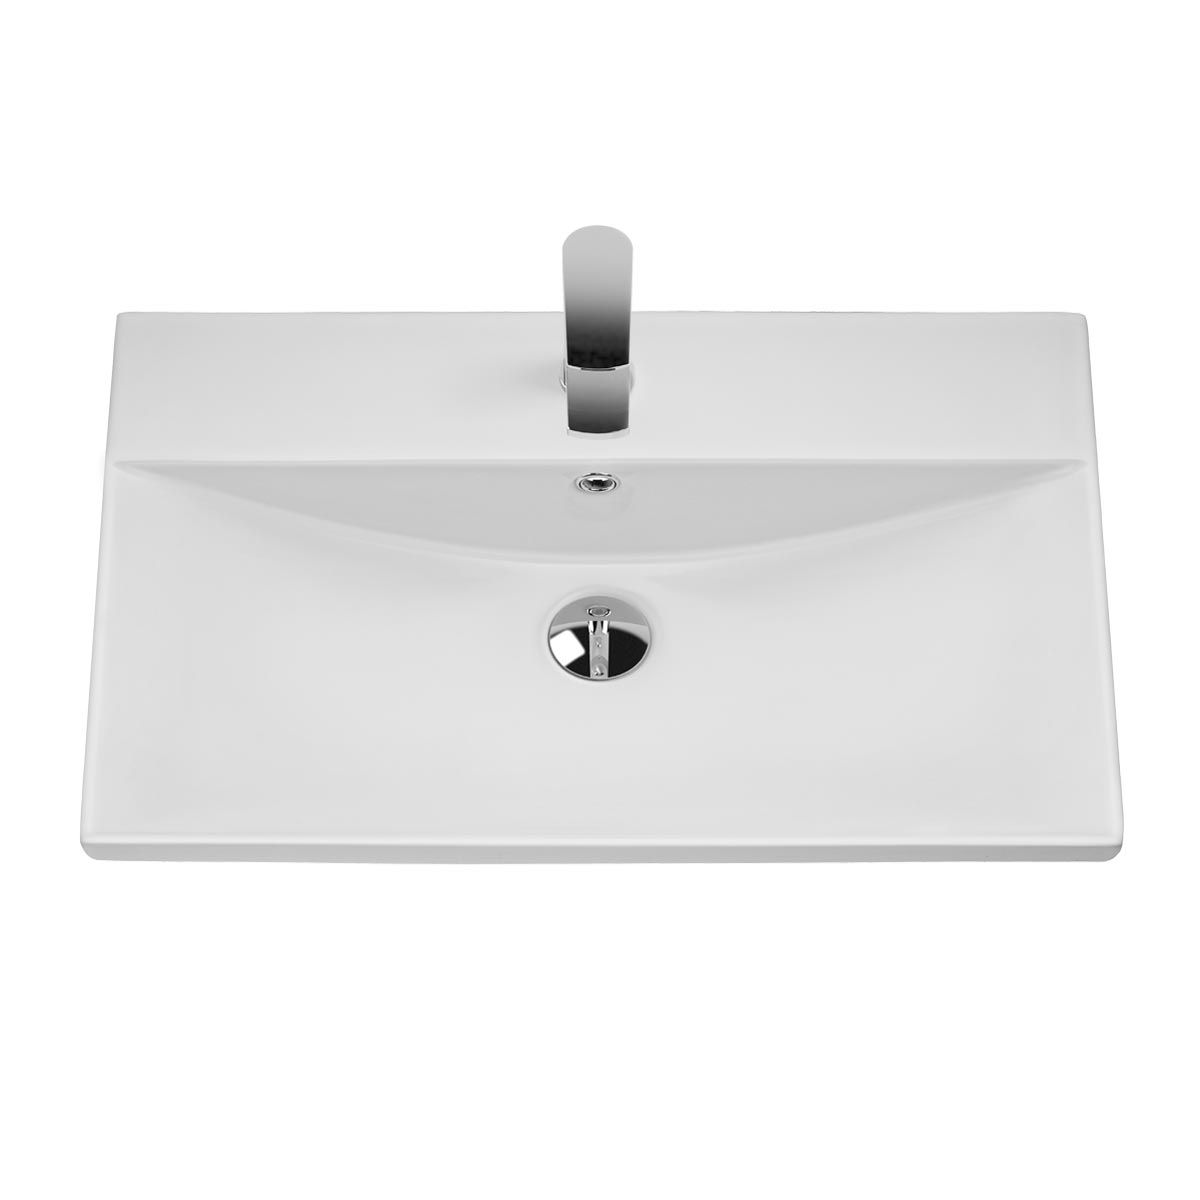 Ceramic 40mm Profile Basin